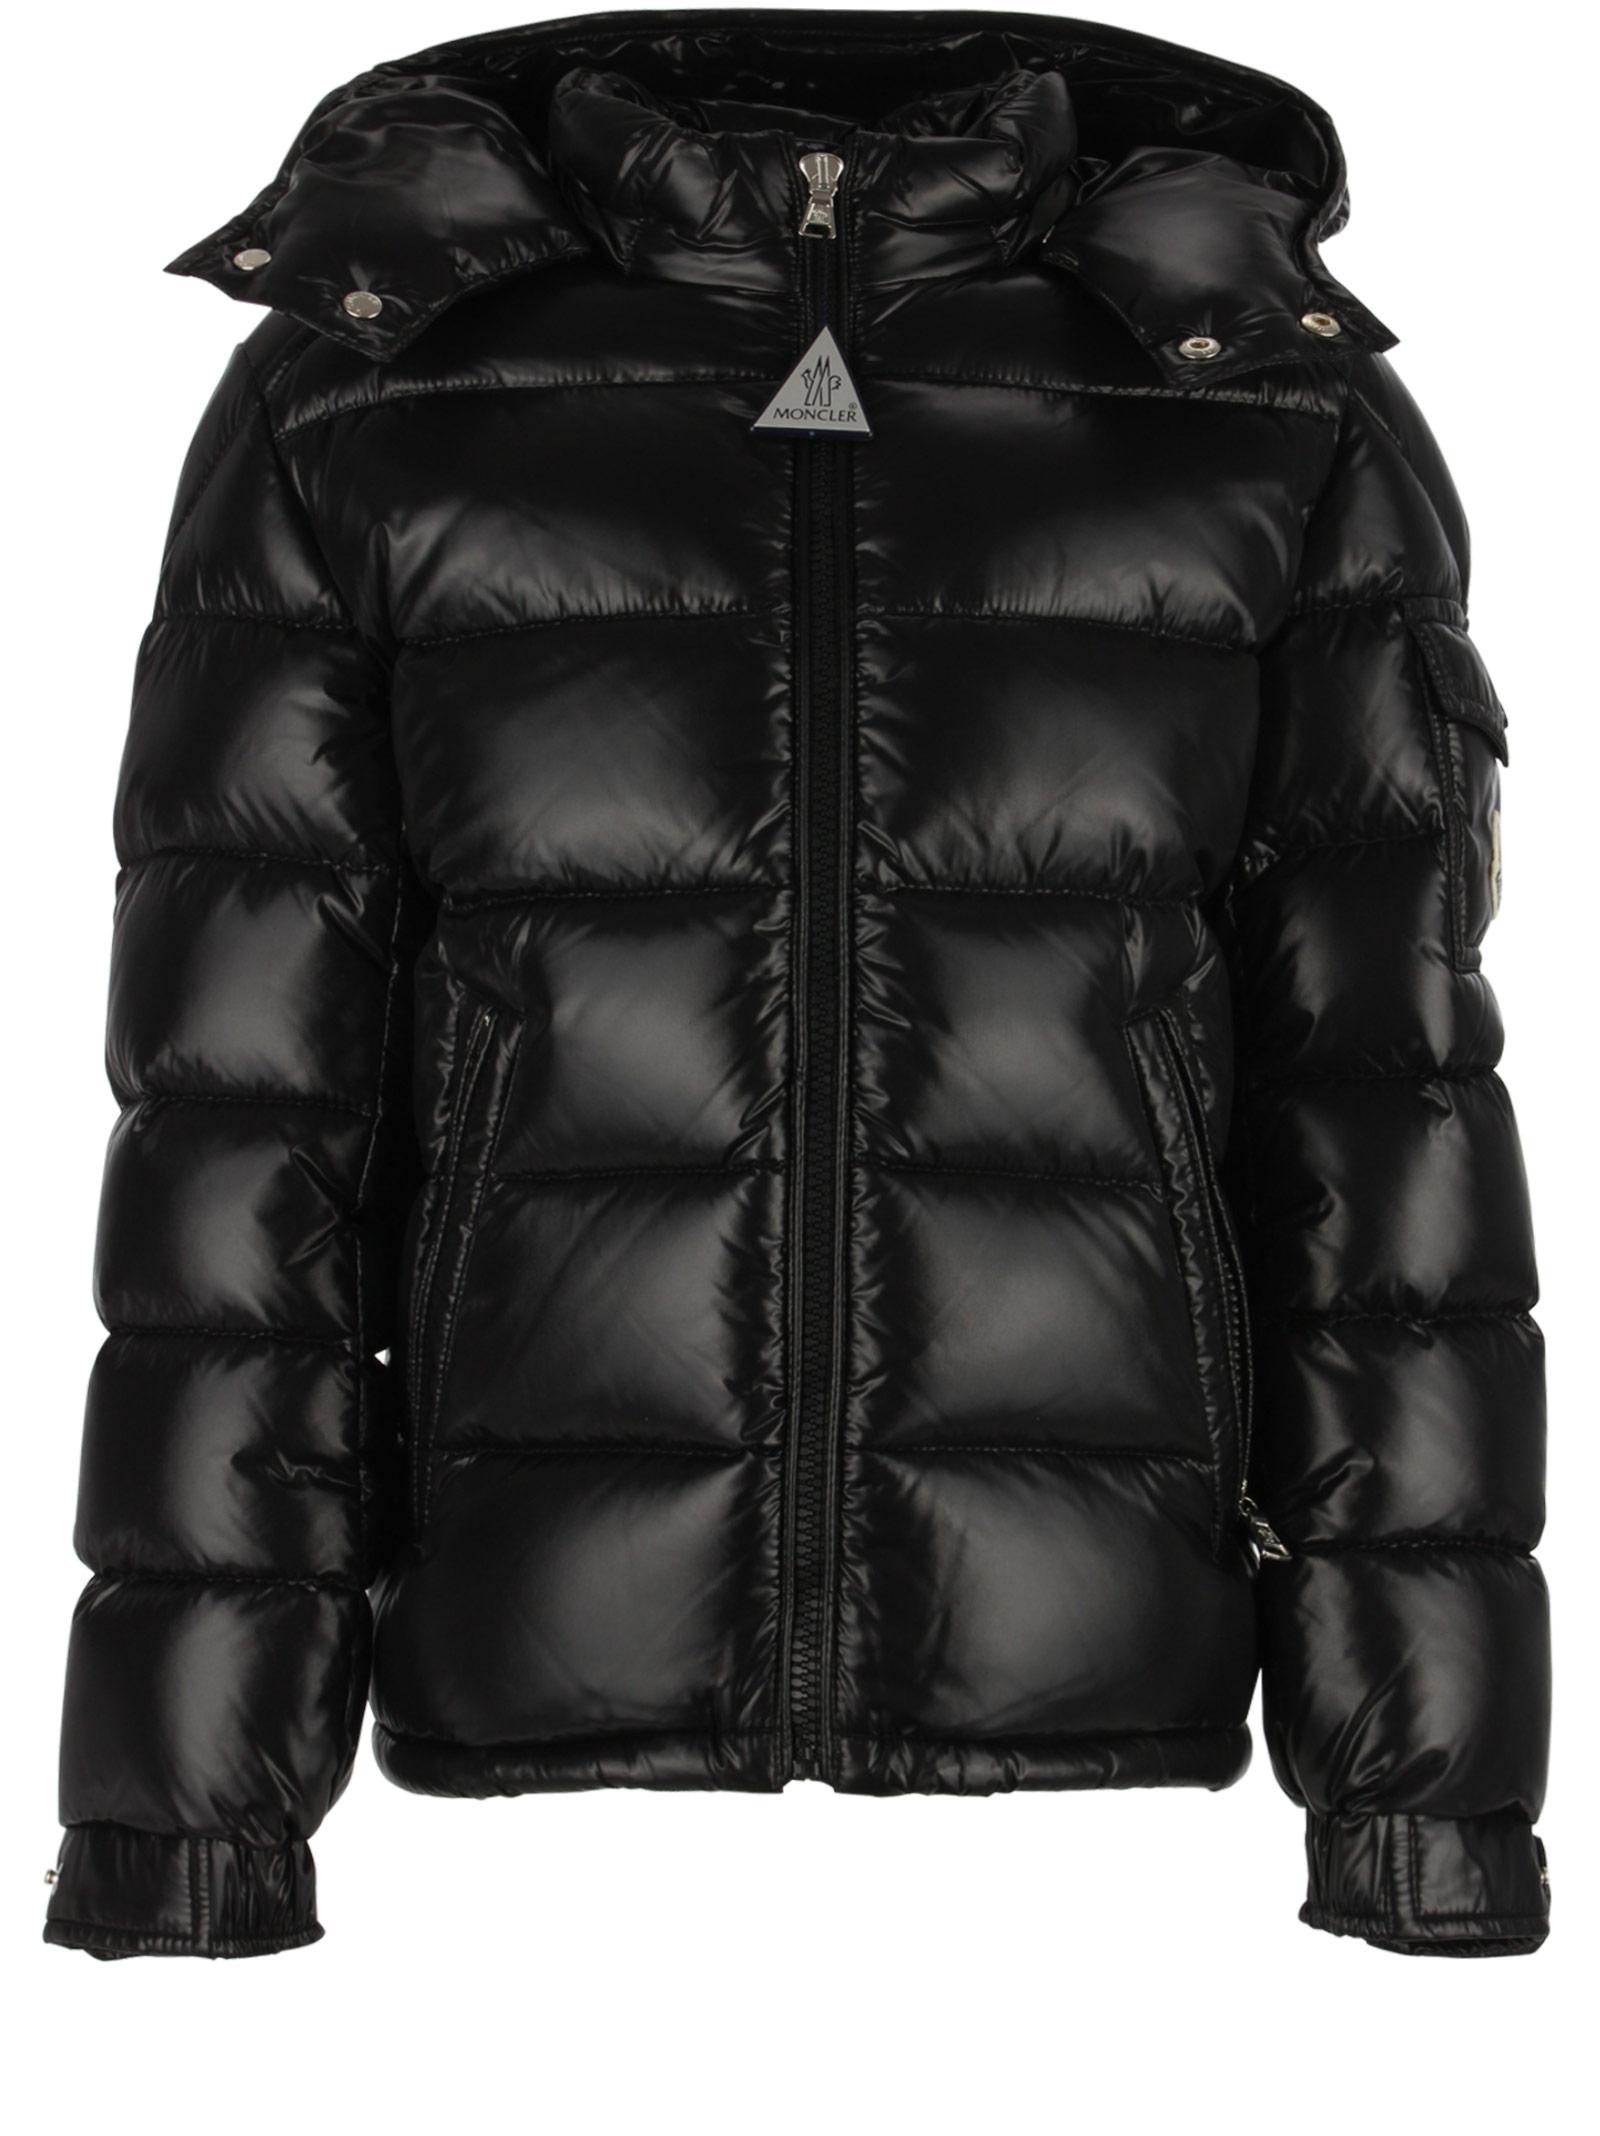 9e68d2474c47 Moncler KIds jacket - Moncler Kids - Michele Franzese Moda